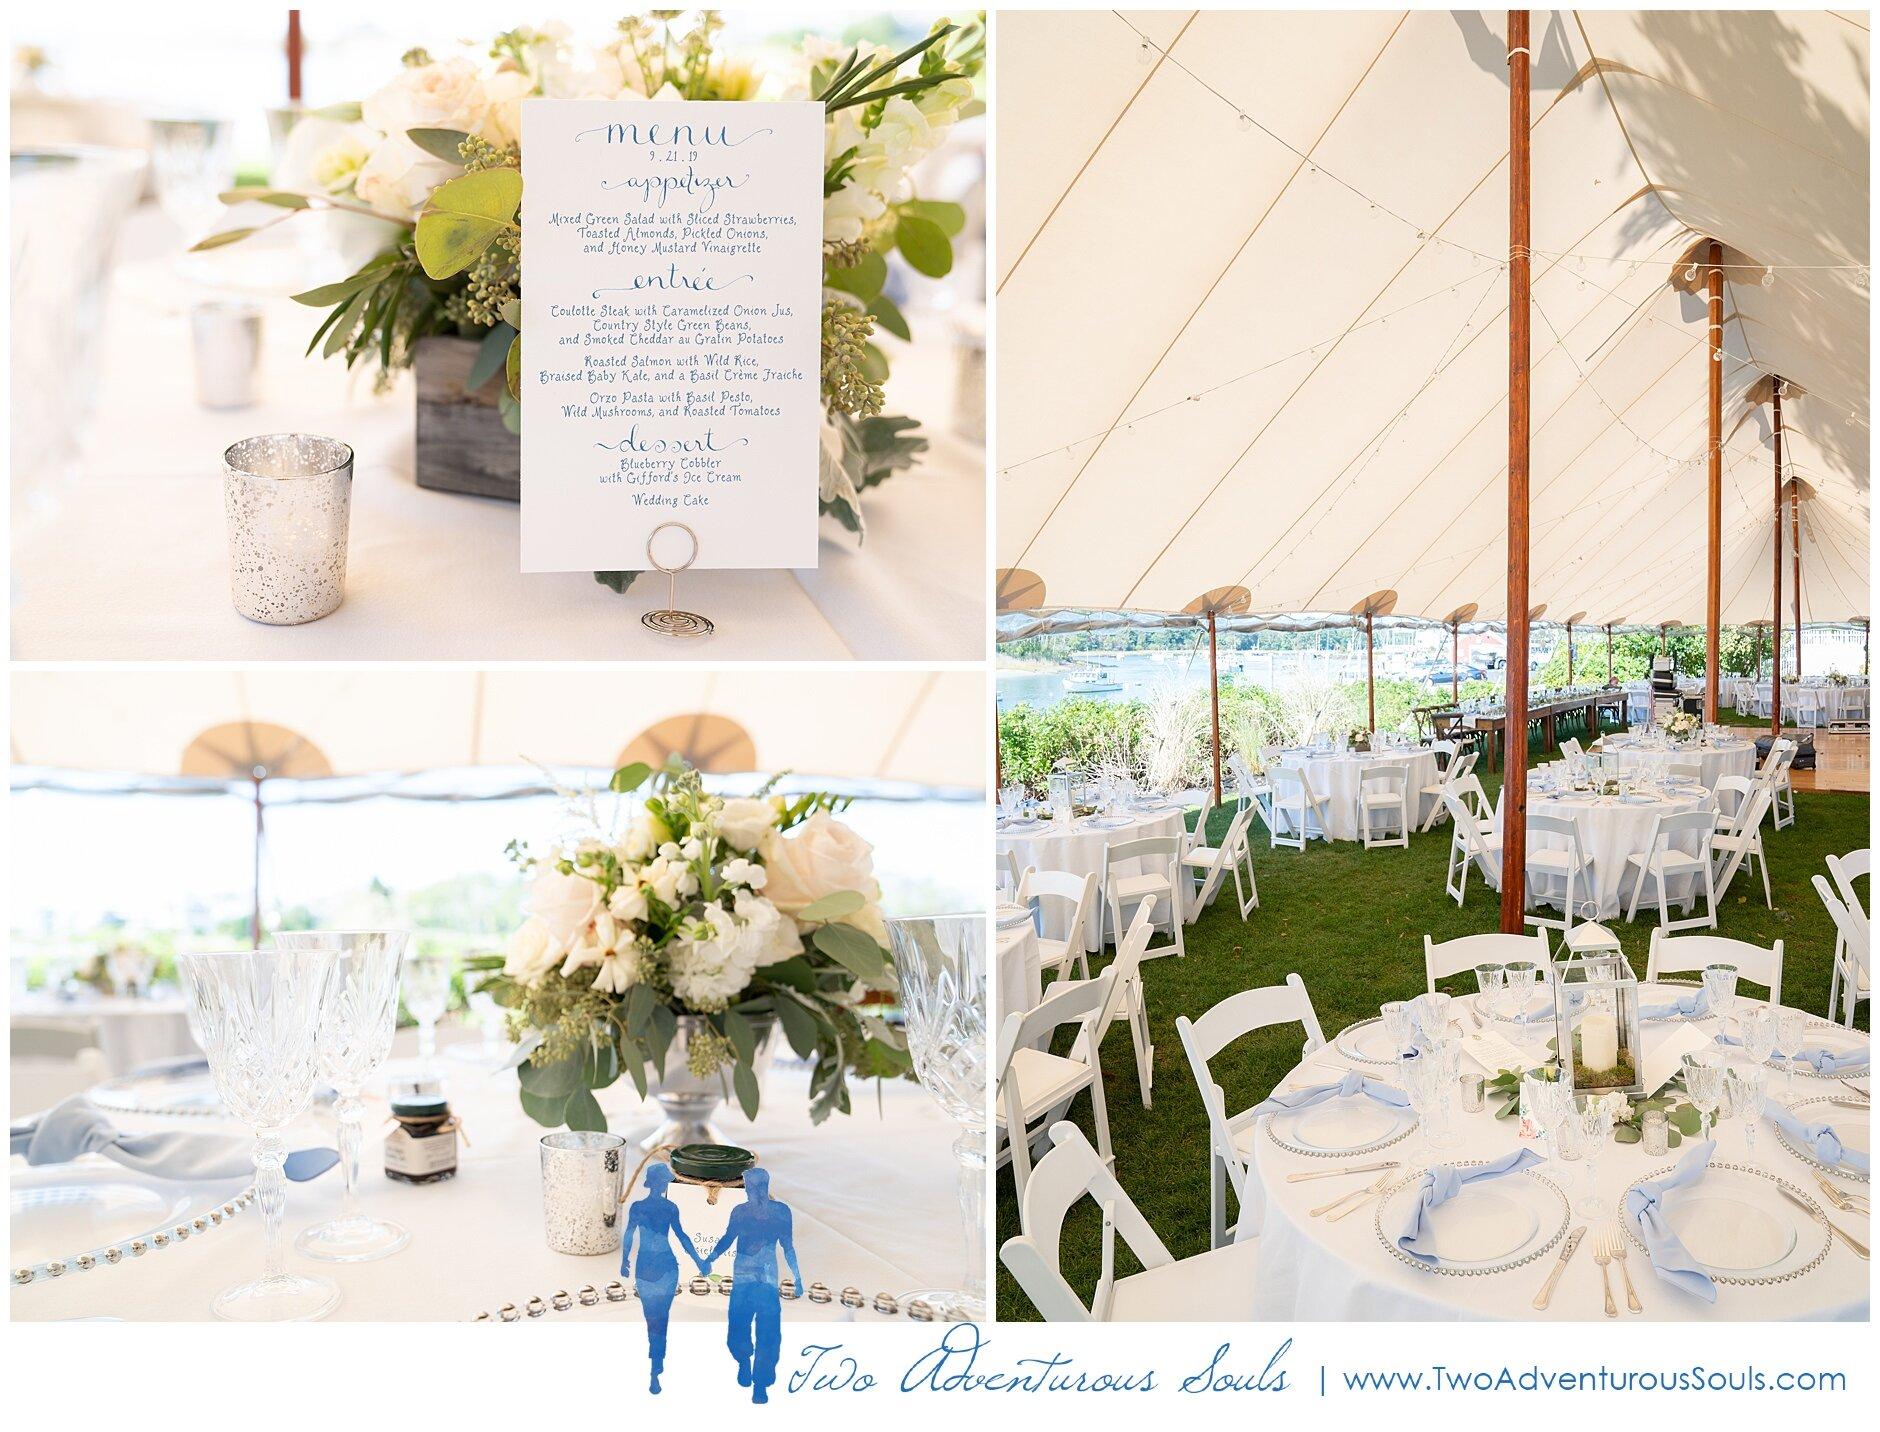 Breakwater Inn and Spa Wedding Photographers, Kennebunkport Wedding Photographers, Two Adventurous Souls- 092119_0010.jpg